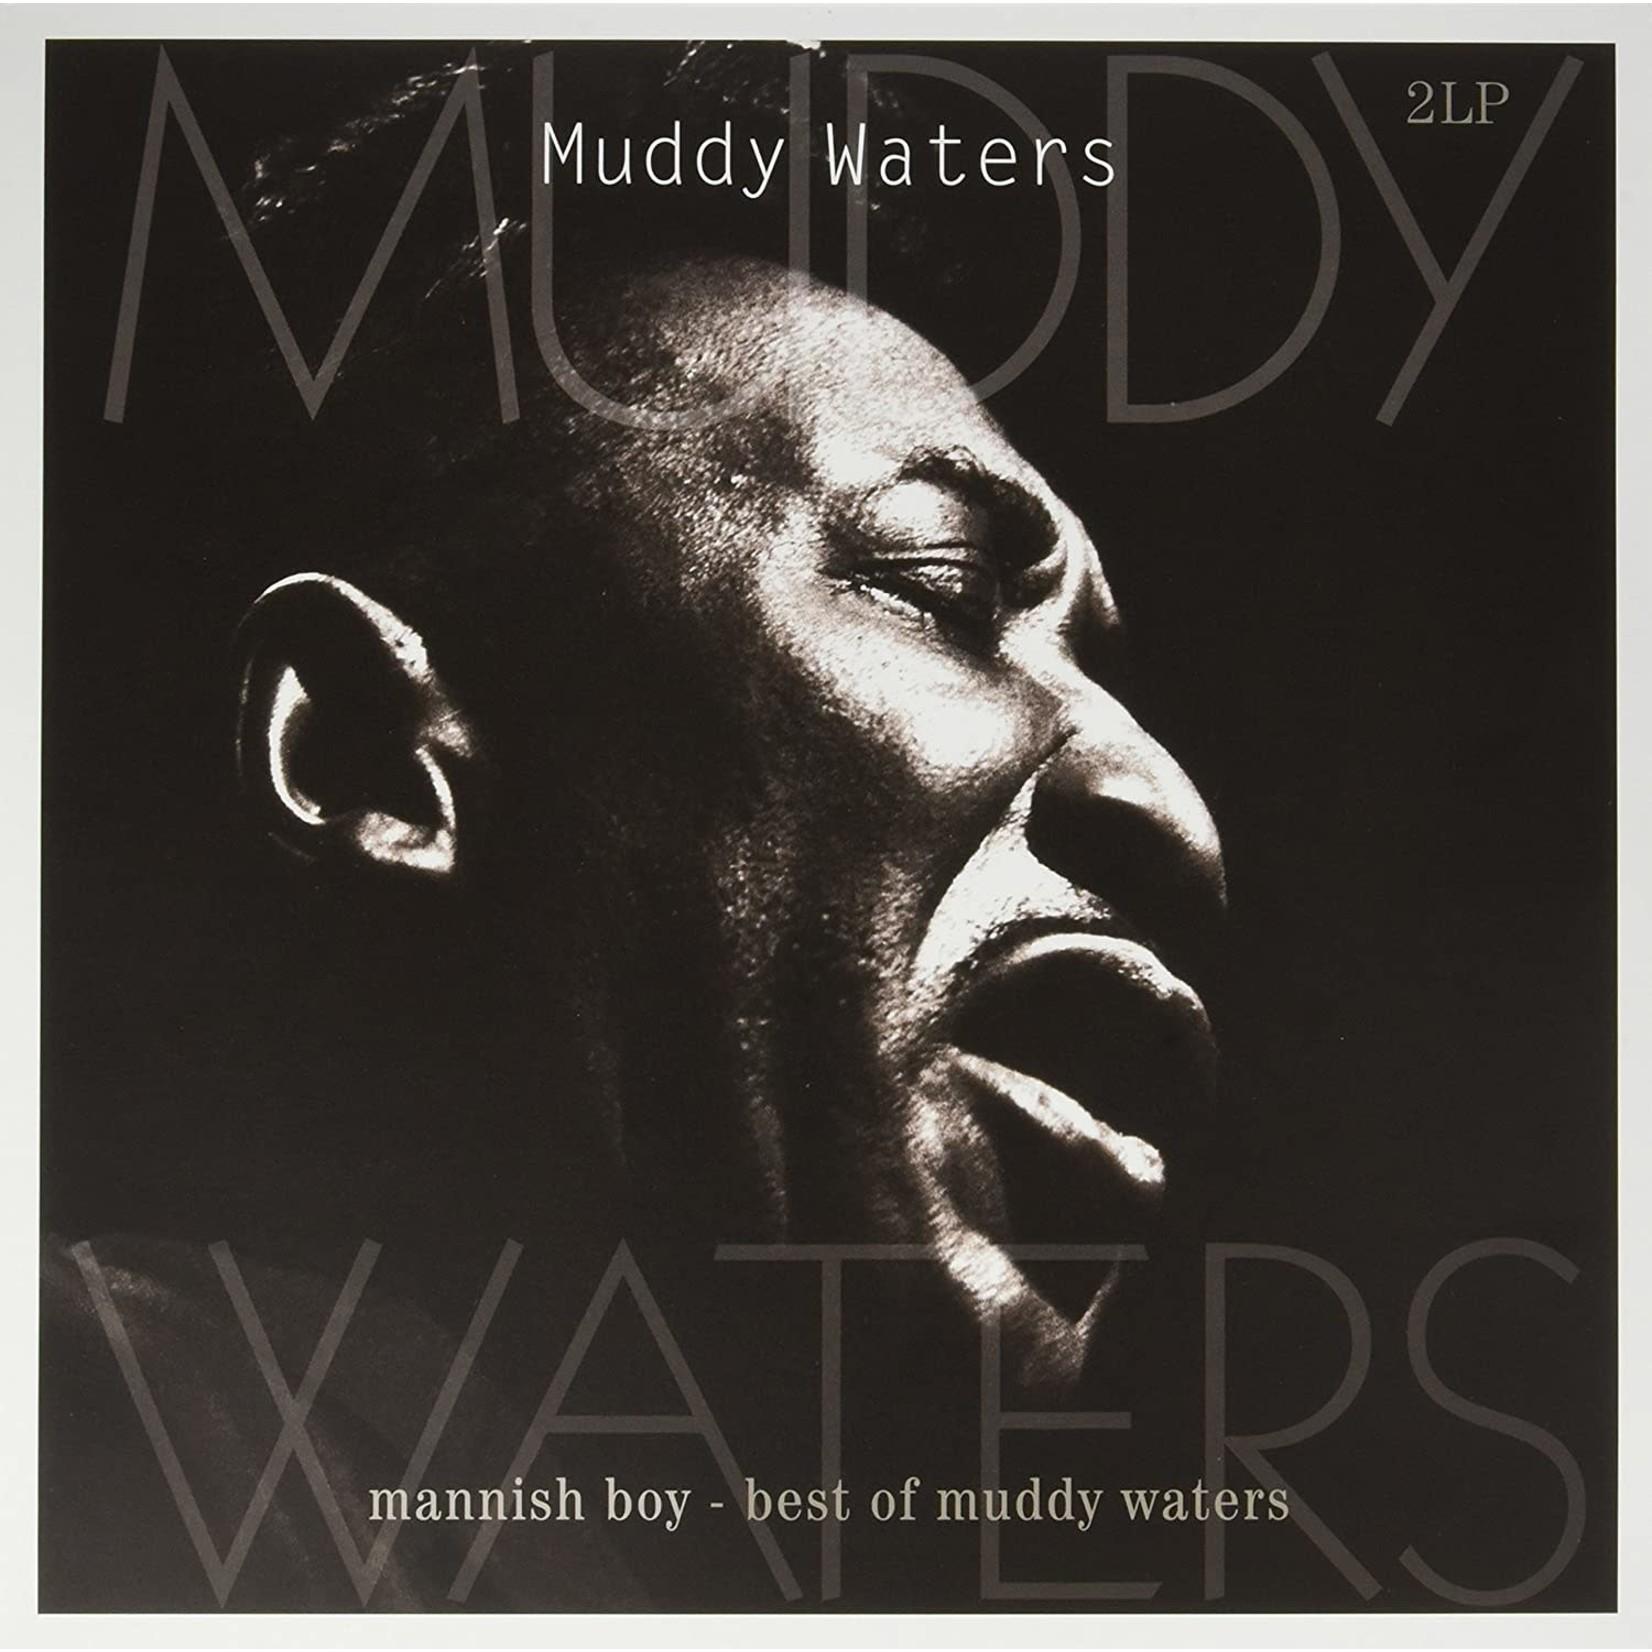 Vinyl Muddy Waters - Mannish Boy: Best Of Muddy Waters